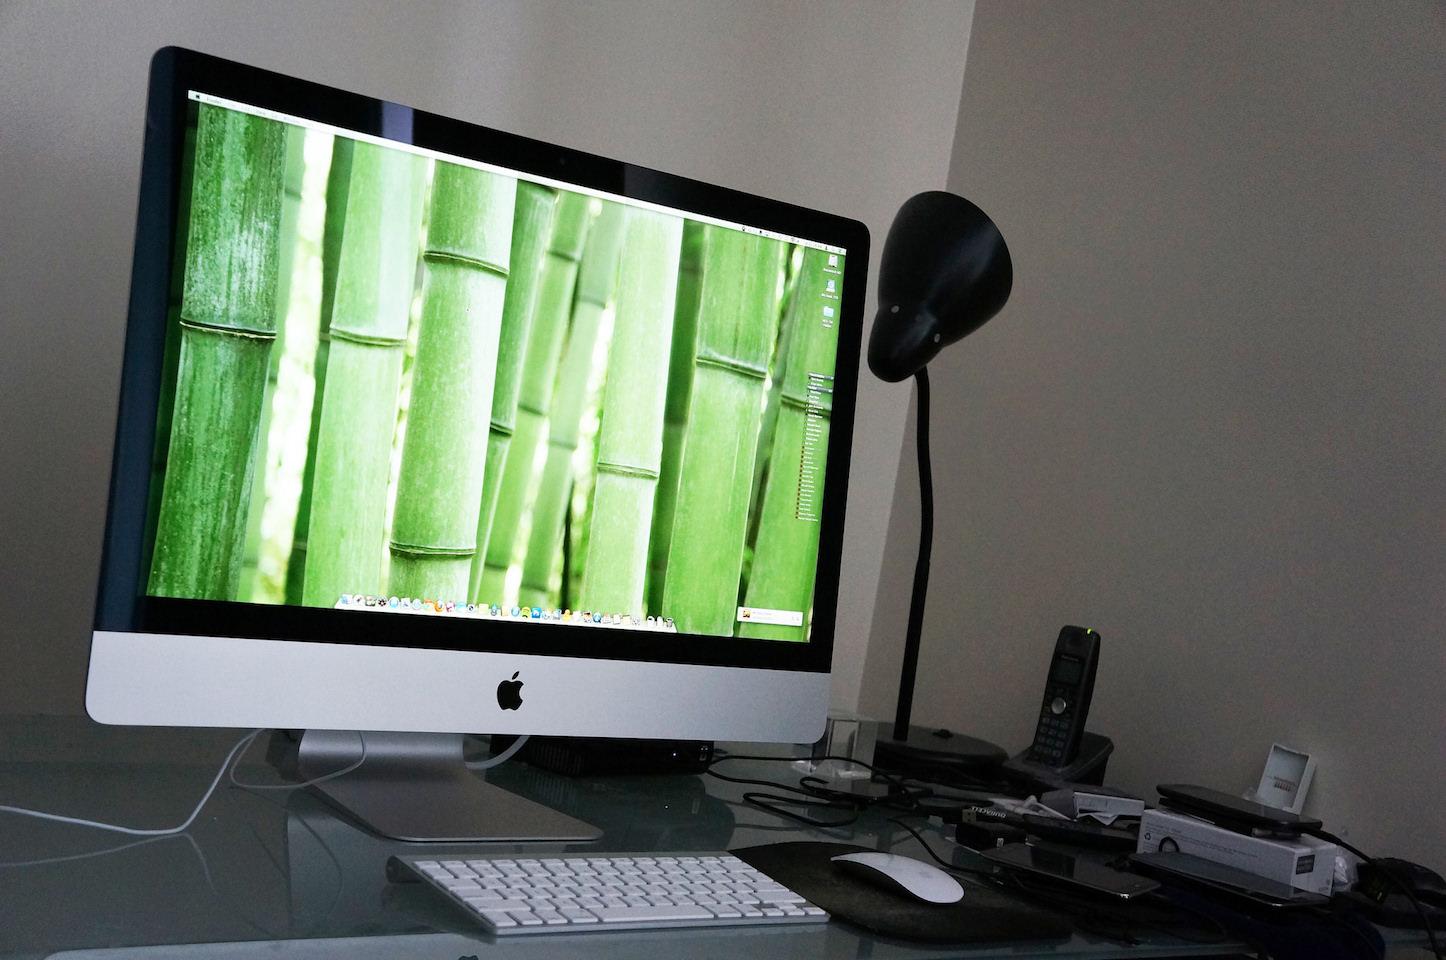 imac-on-a-desk.jpg